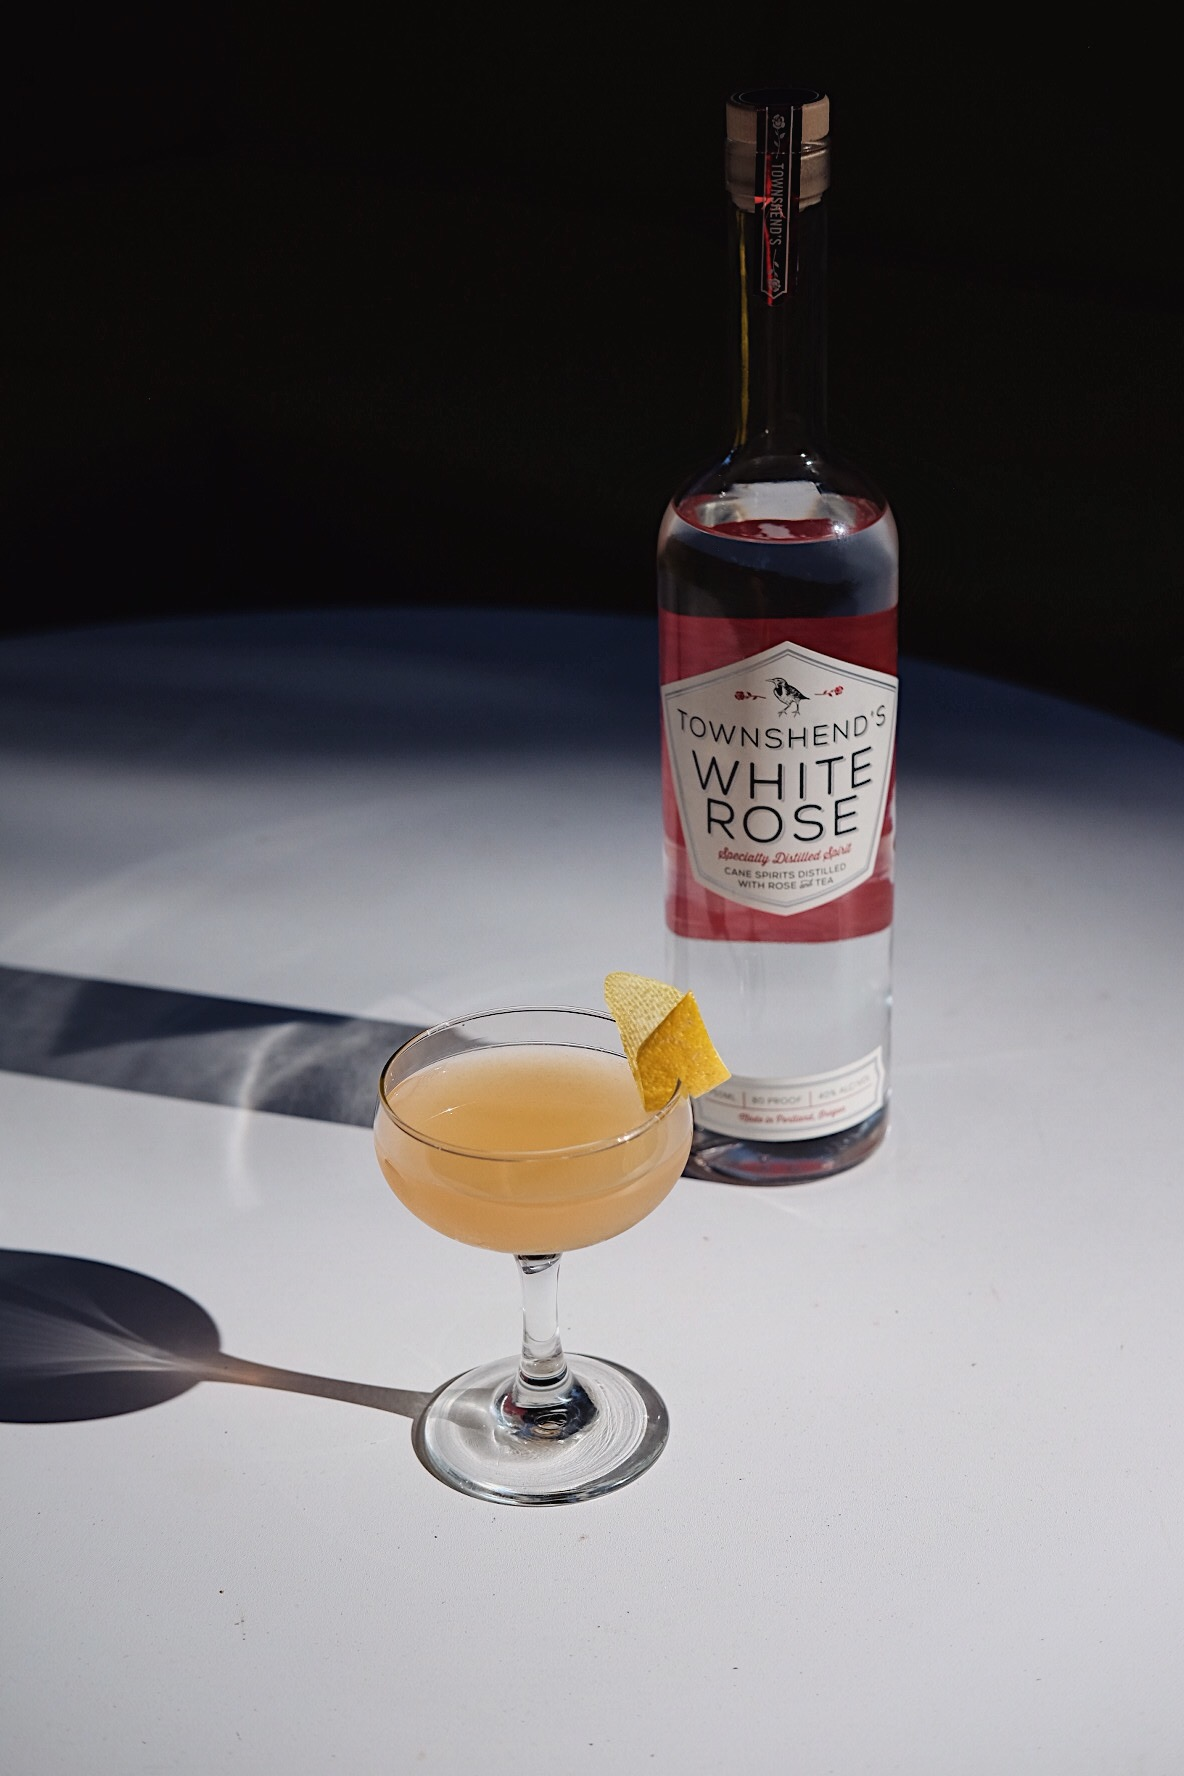 ingredients: - 1 1/2 oz White Rose Spirit1/2 oz Cascadia Bitter Liqueur3/4 oz pink grapefruit juice1/4 oz honey syrupGarnish: lemon zest